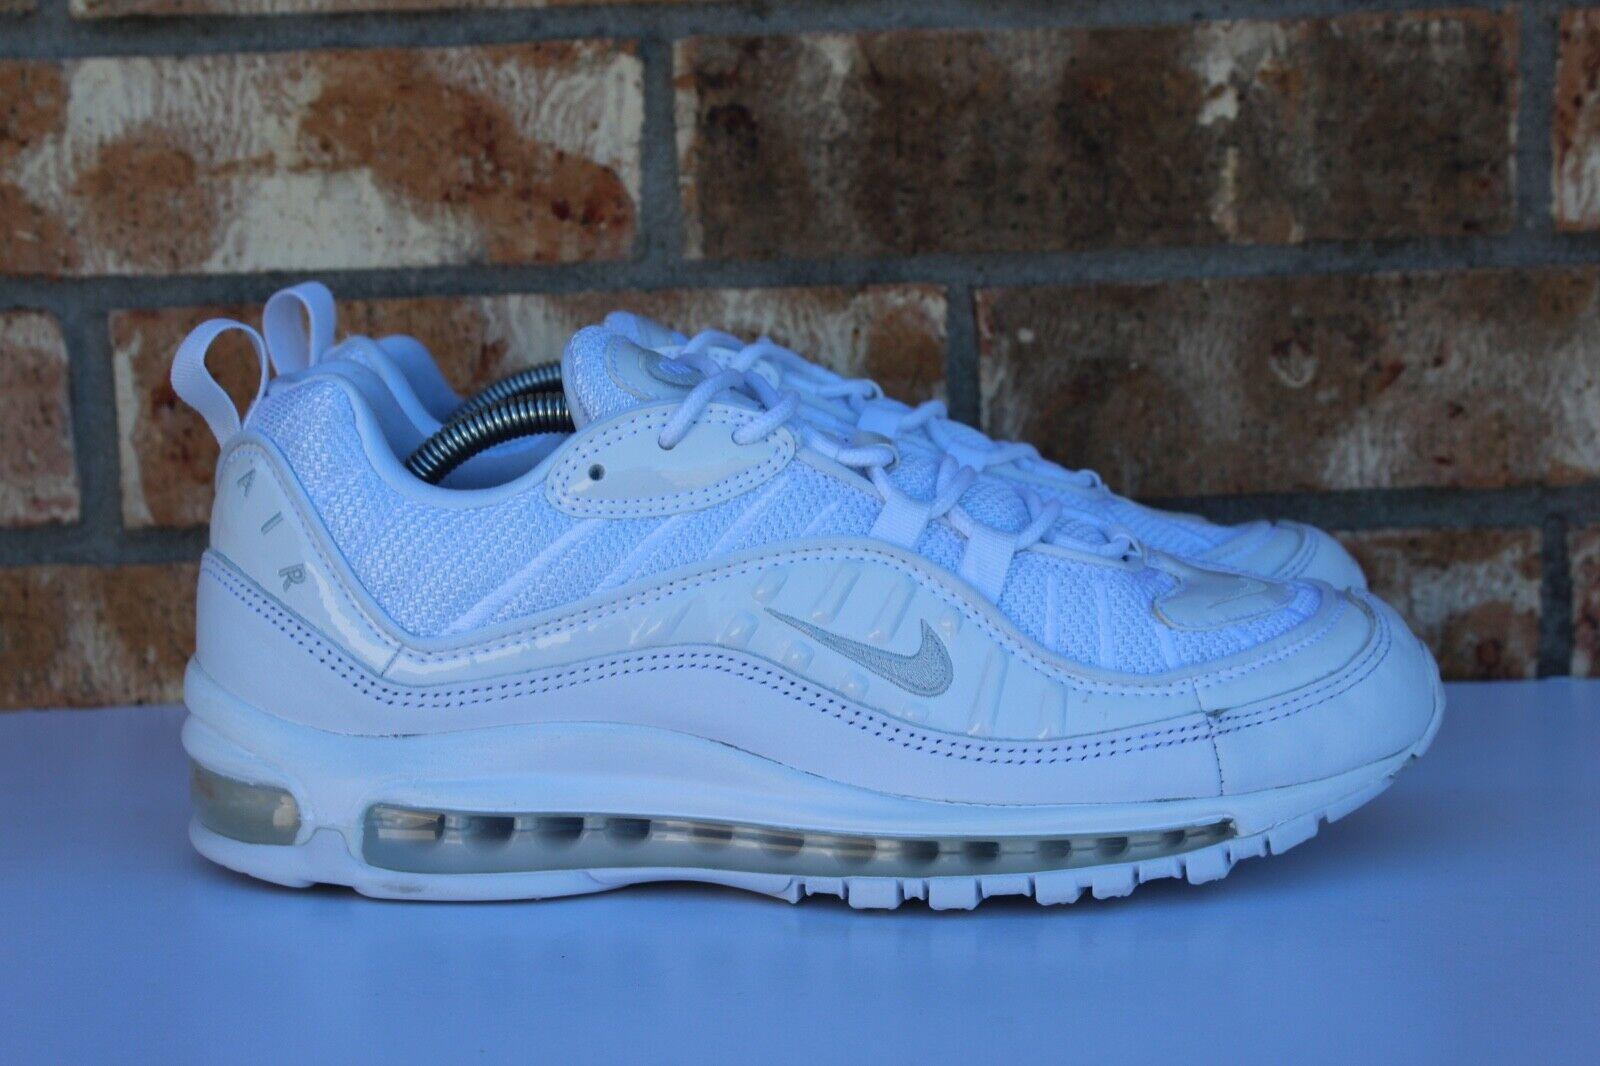 9f0dbffbf058 Men s Nike Air Max 98 Running Shoes Triple White Pure Platinum Sz ...